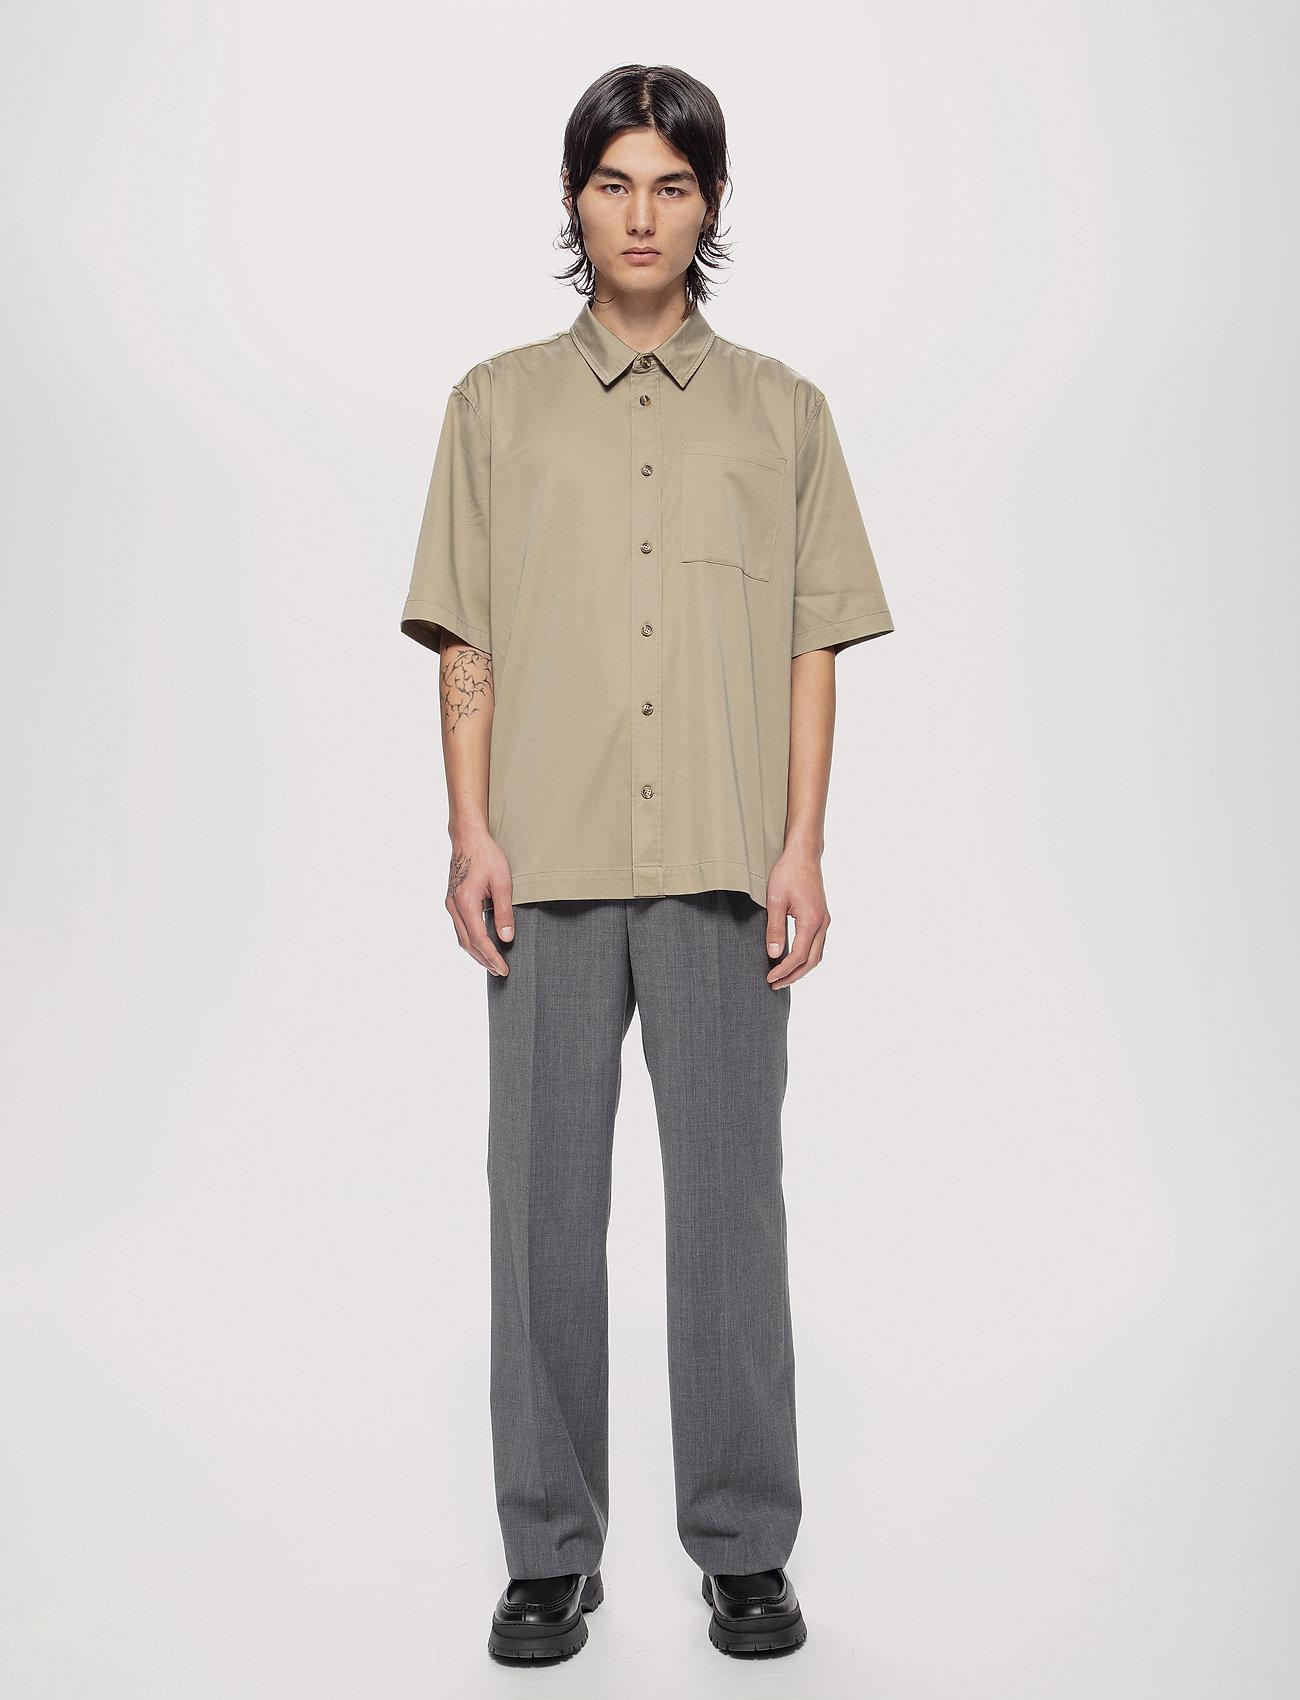 HAN Kjøbenhavn - Boxy Shirt SS - oxford overhemden - olive grey - 0